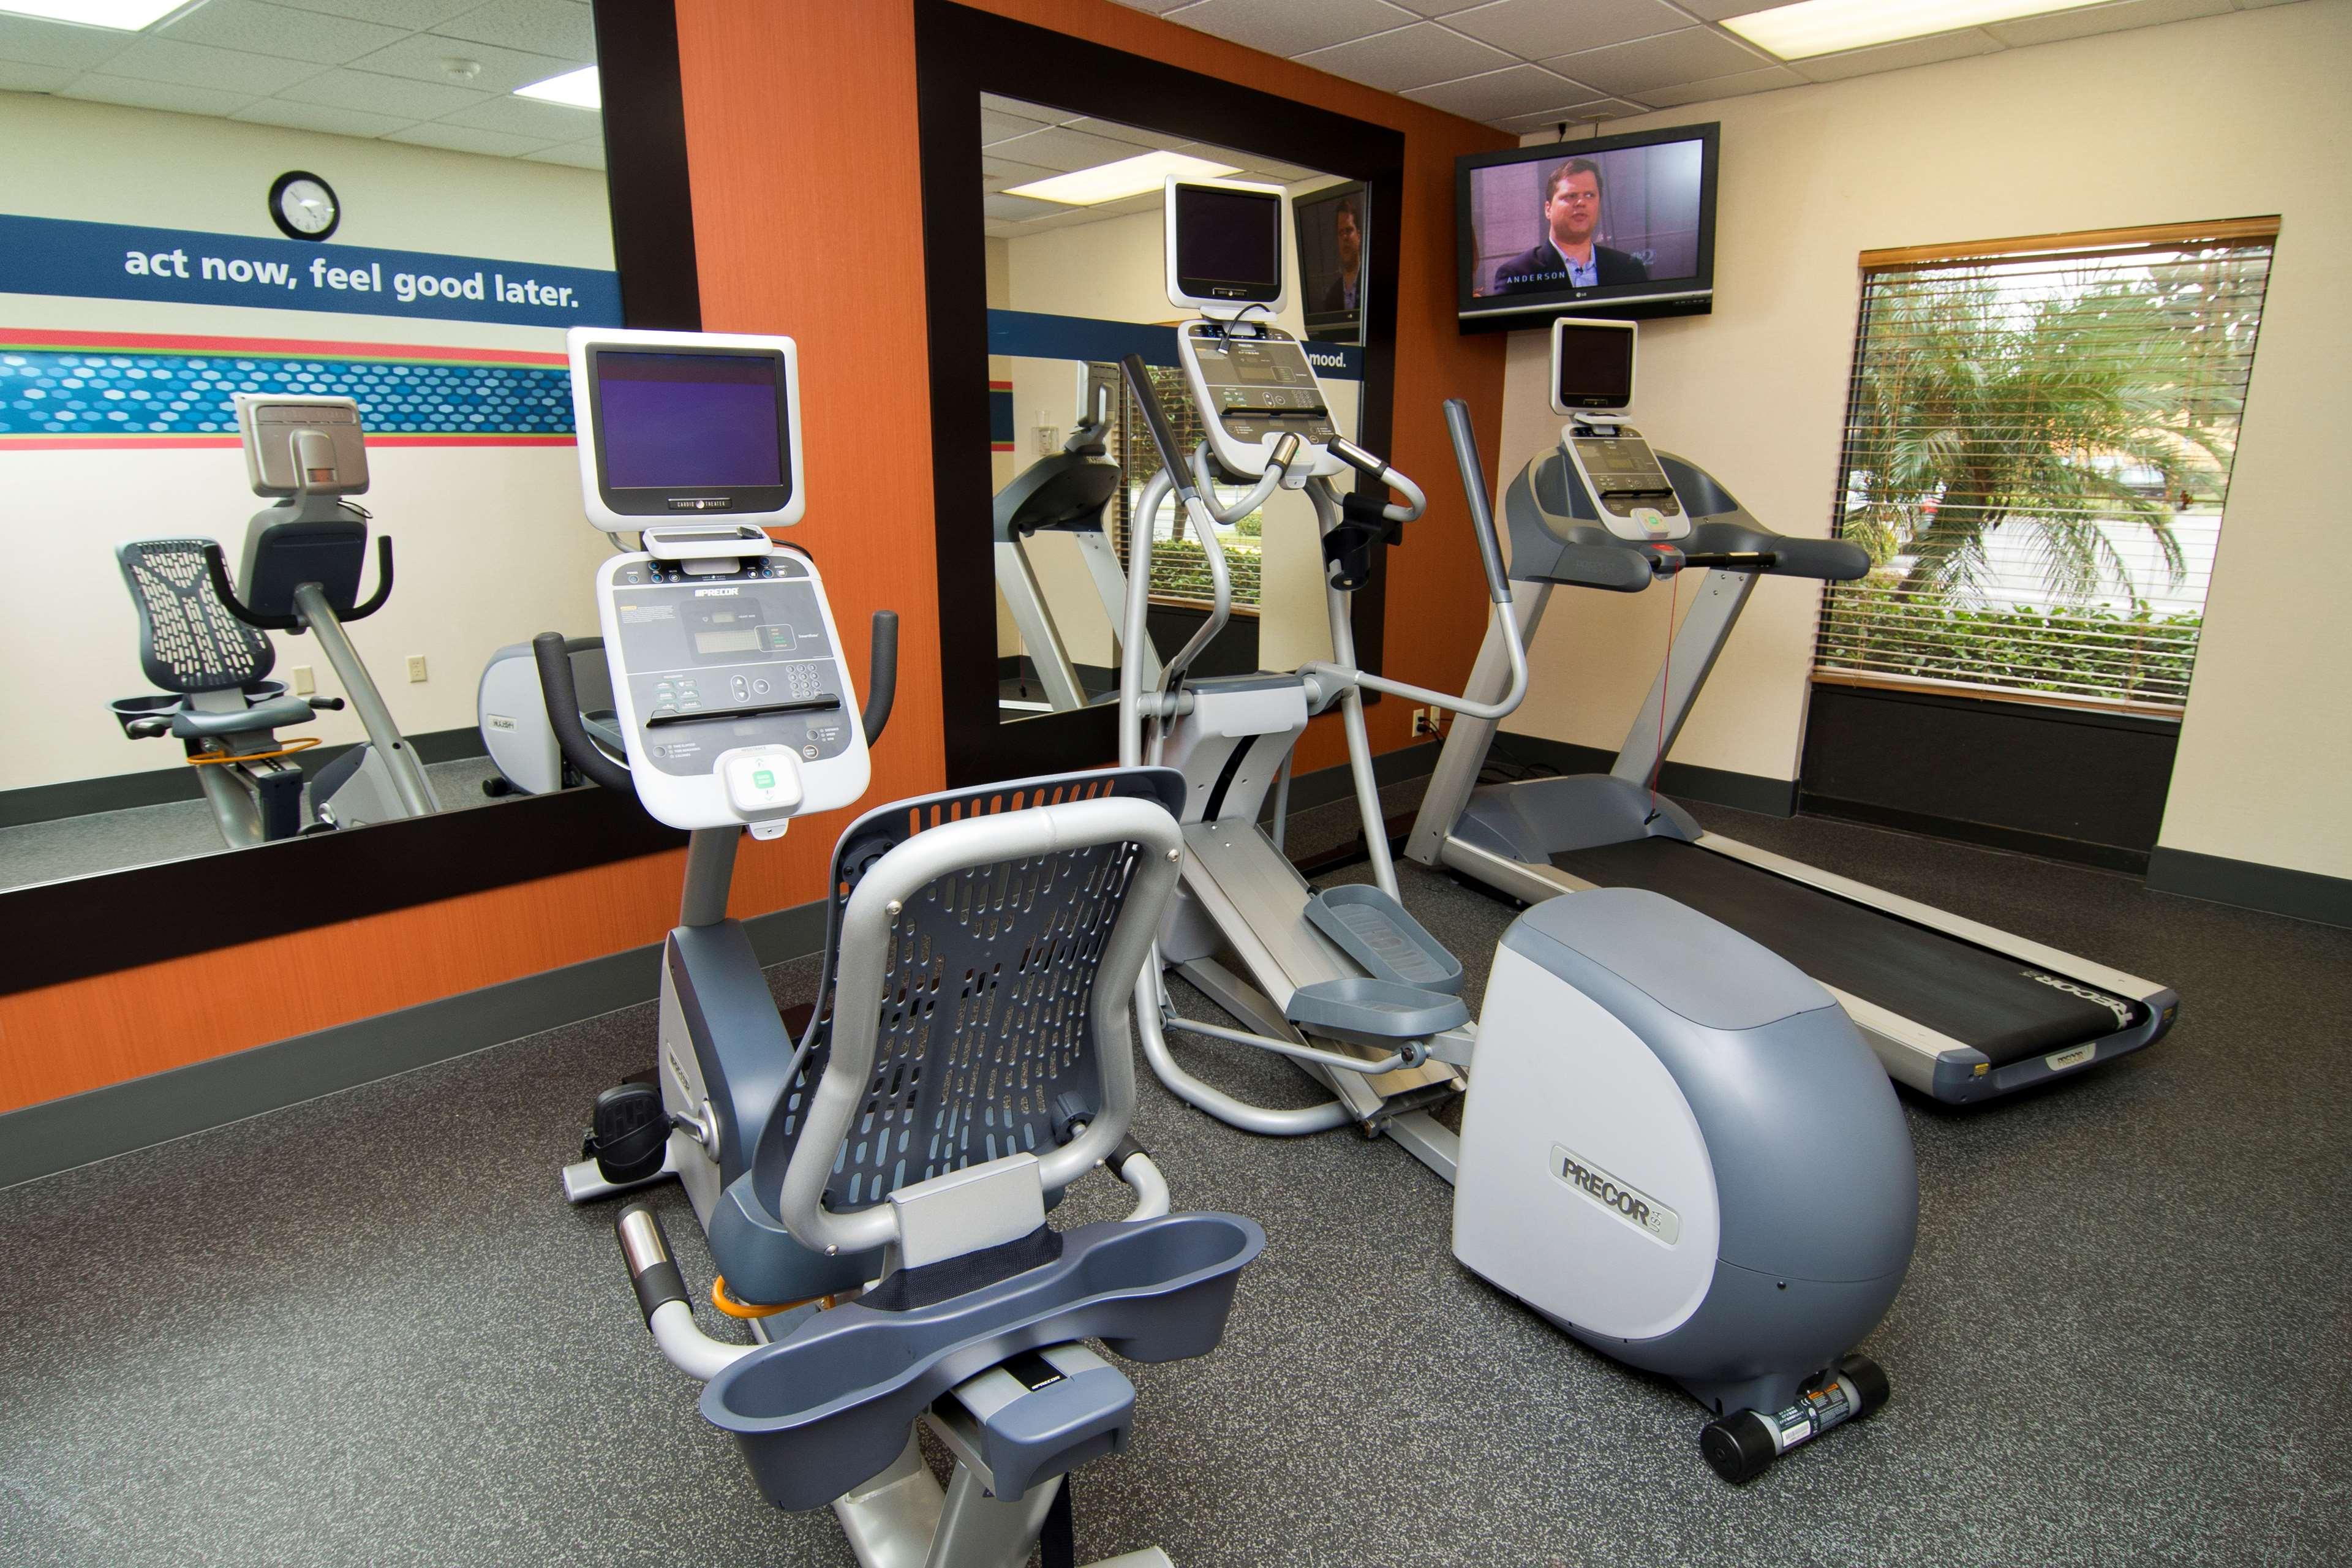 Hampton Inn & Suites Orlando Intl Dr N image 9